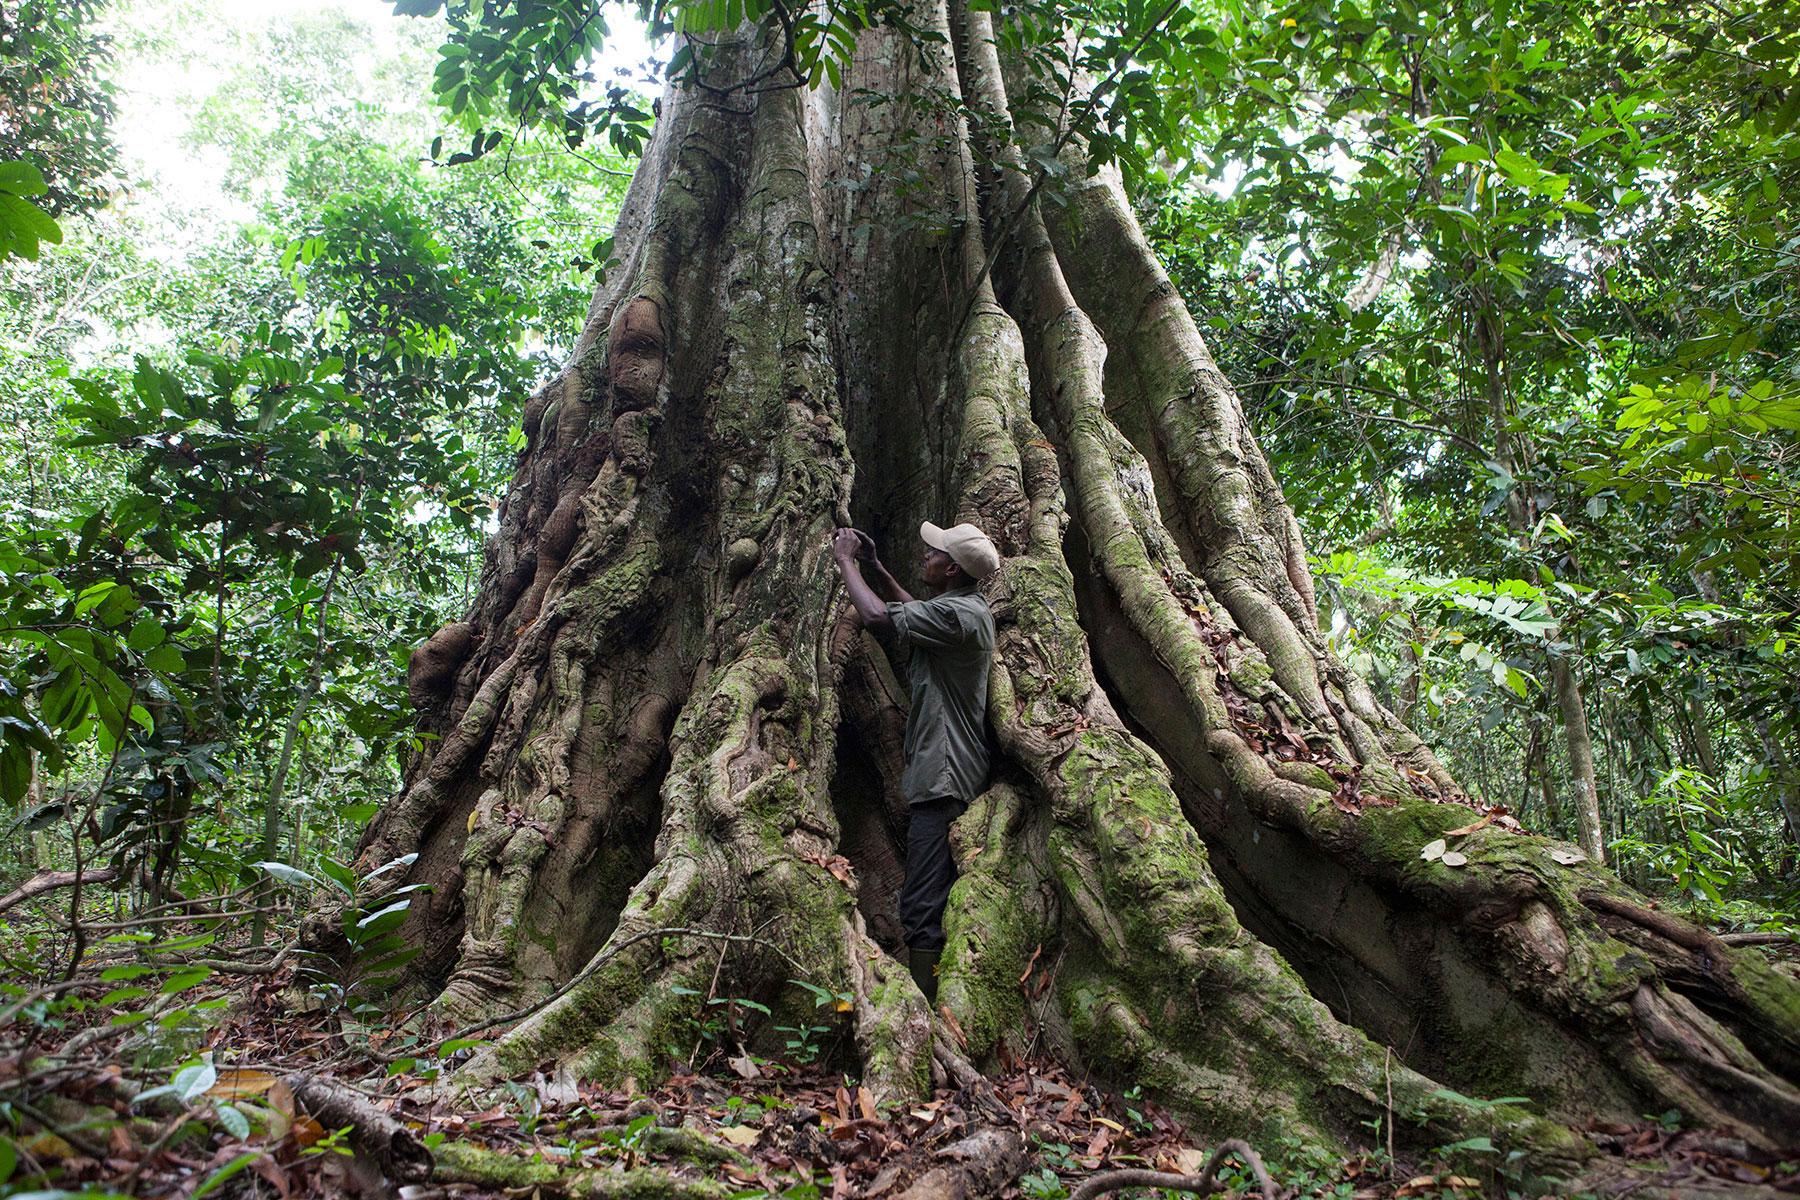 congo-gorillas-tree-sophie-smith